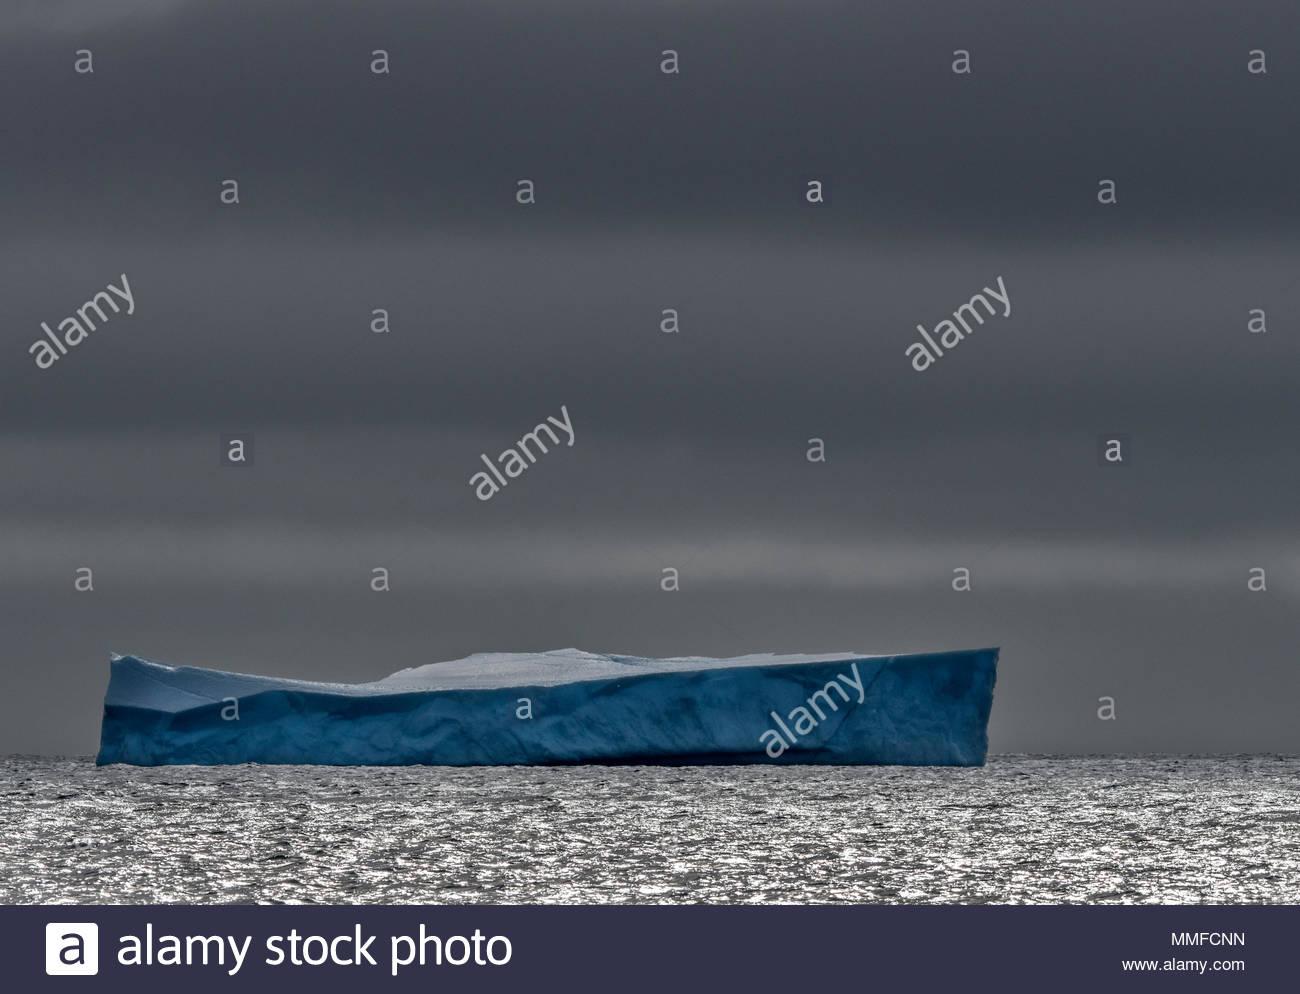 A lone iceberg in Nunavut, Canada. - Stock Image